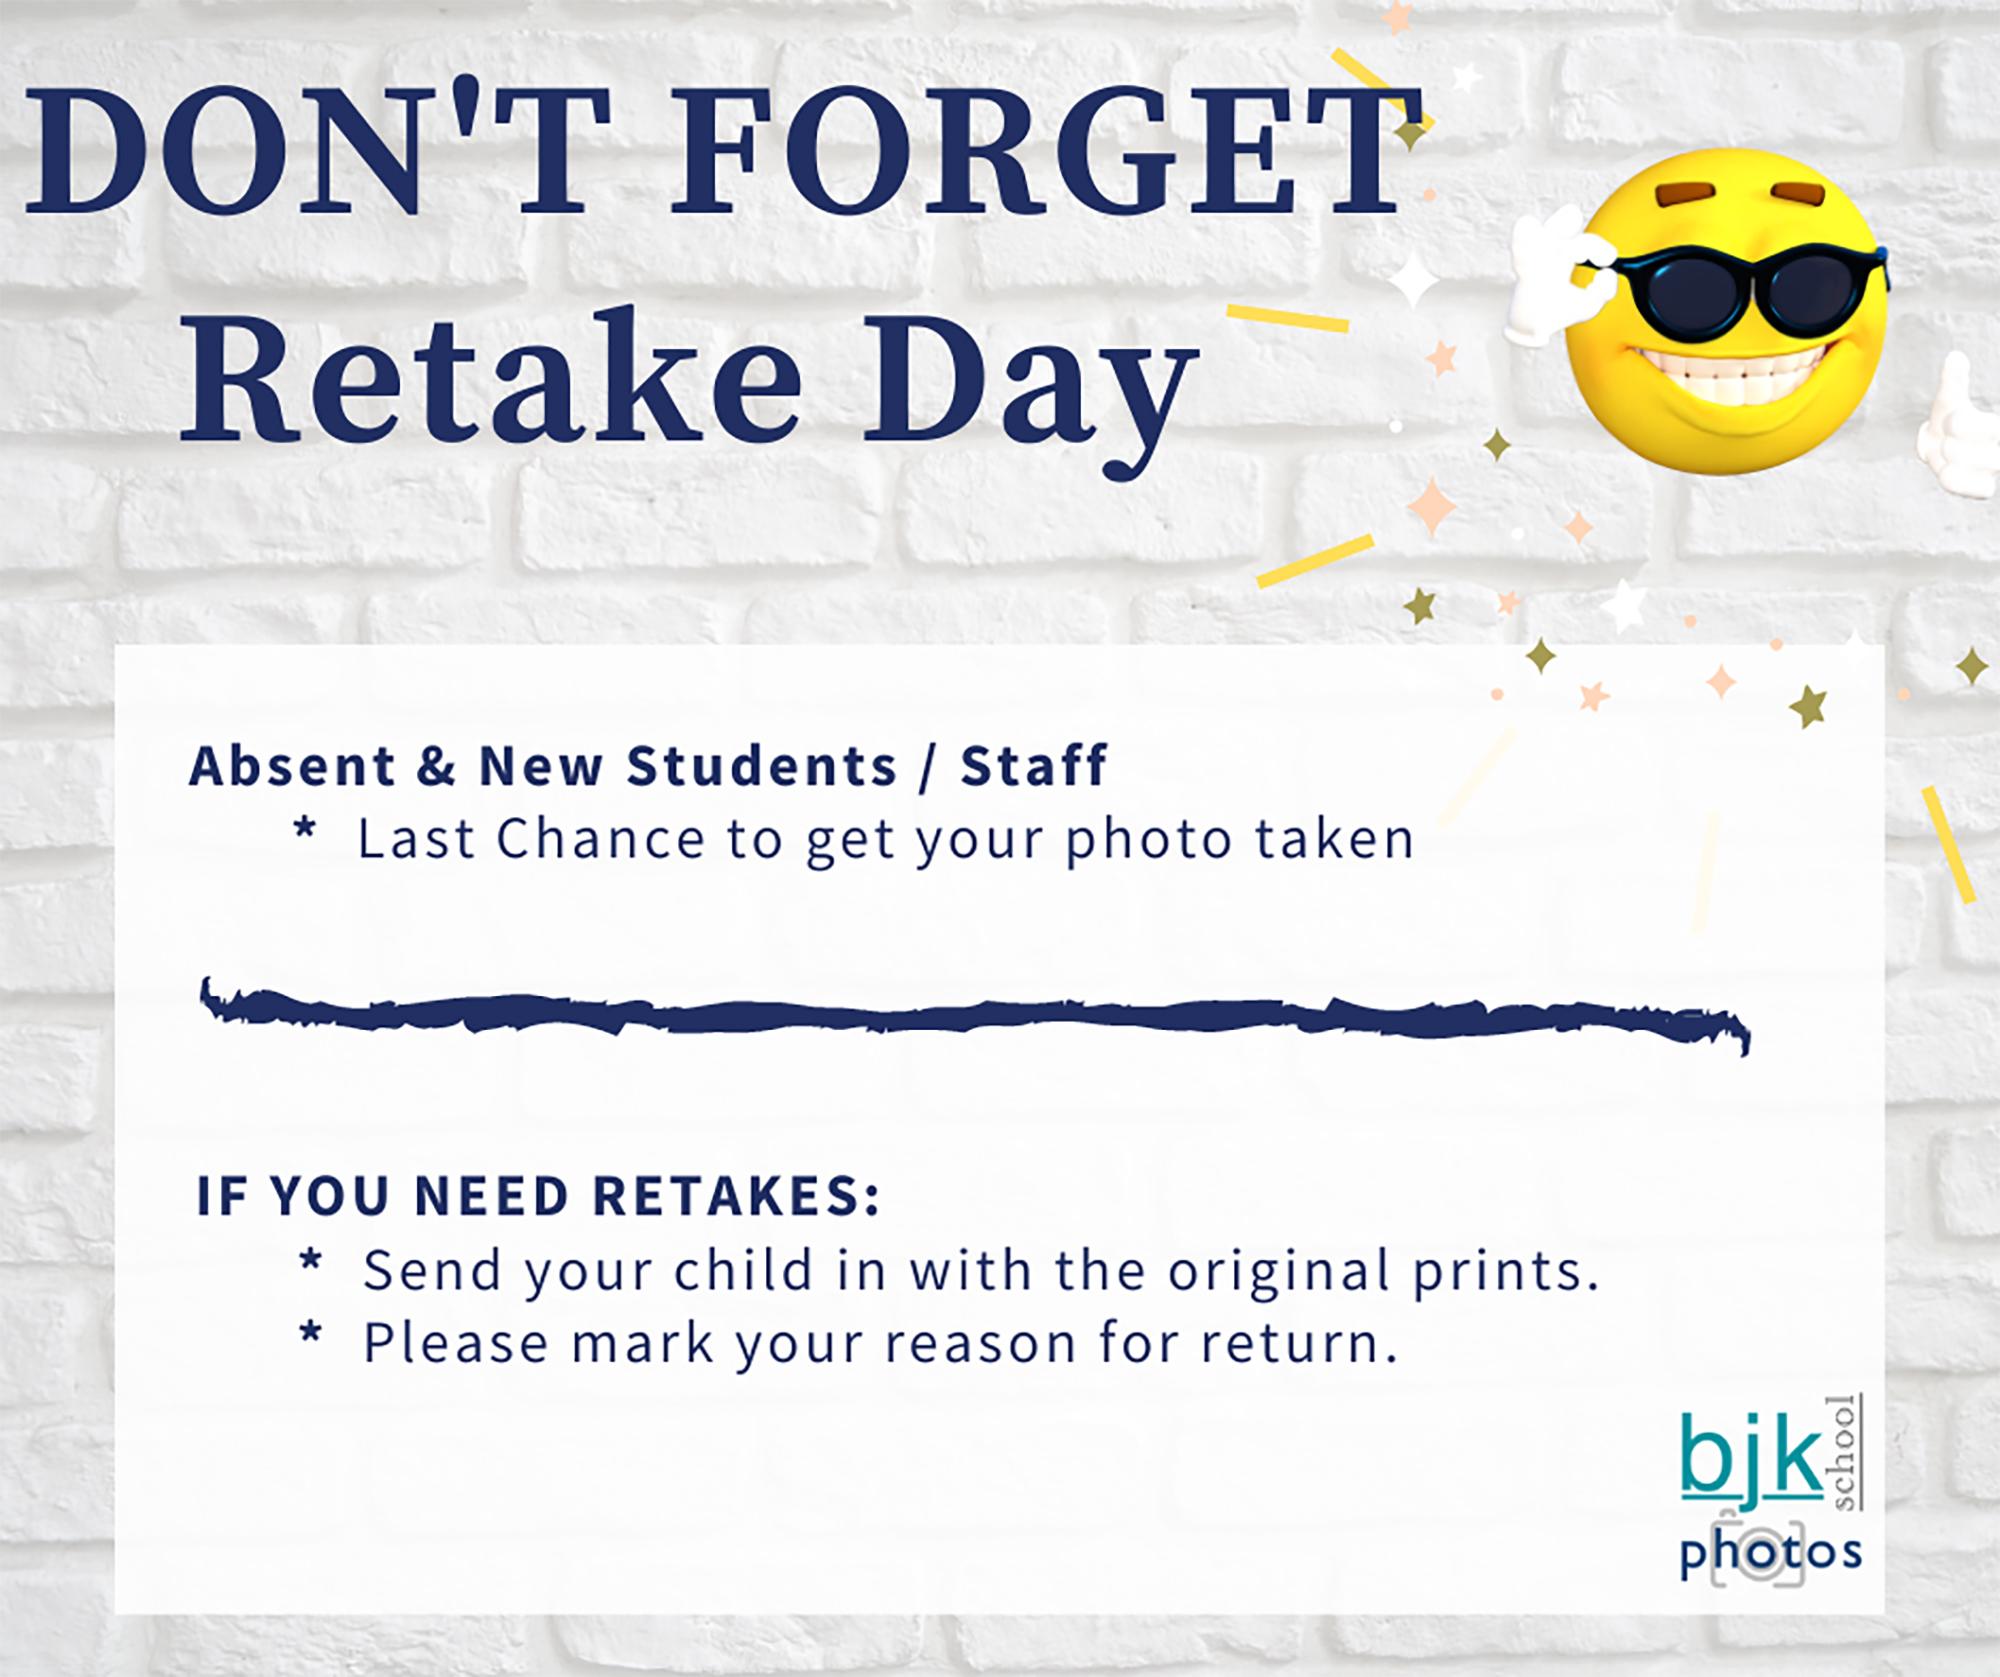 Don't Forget Retake Day illustration (10/2020)